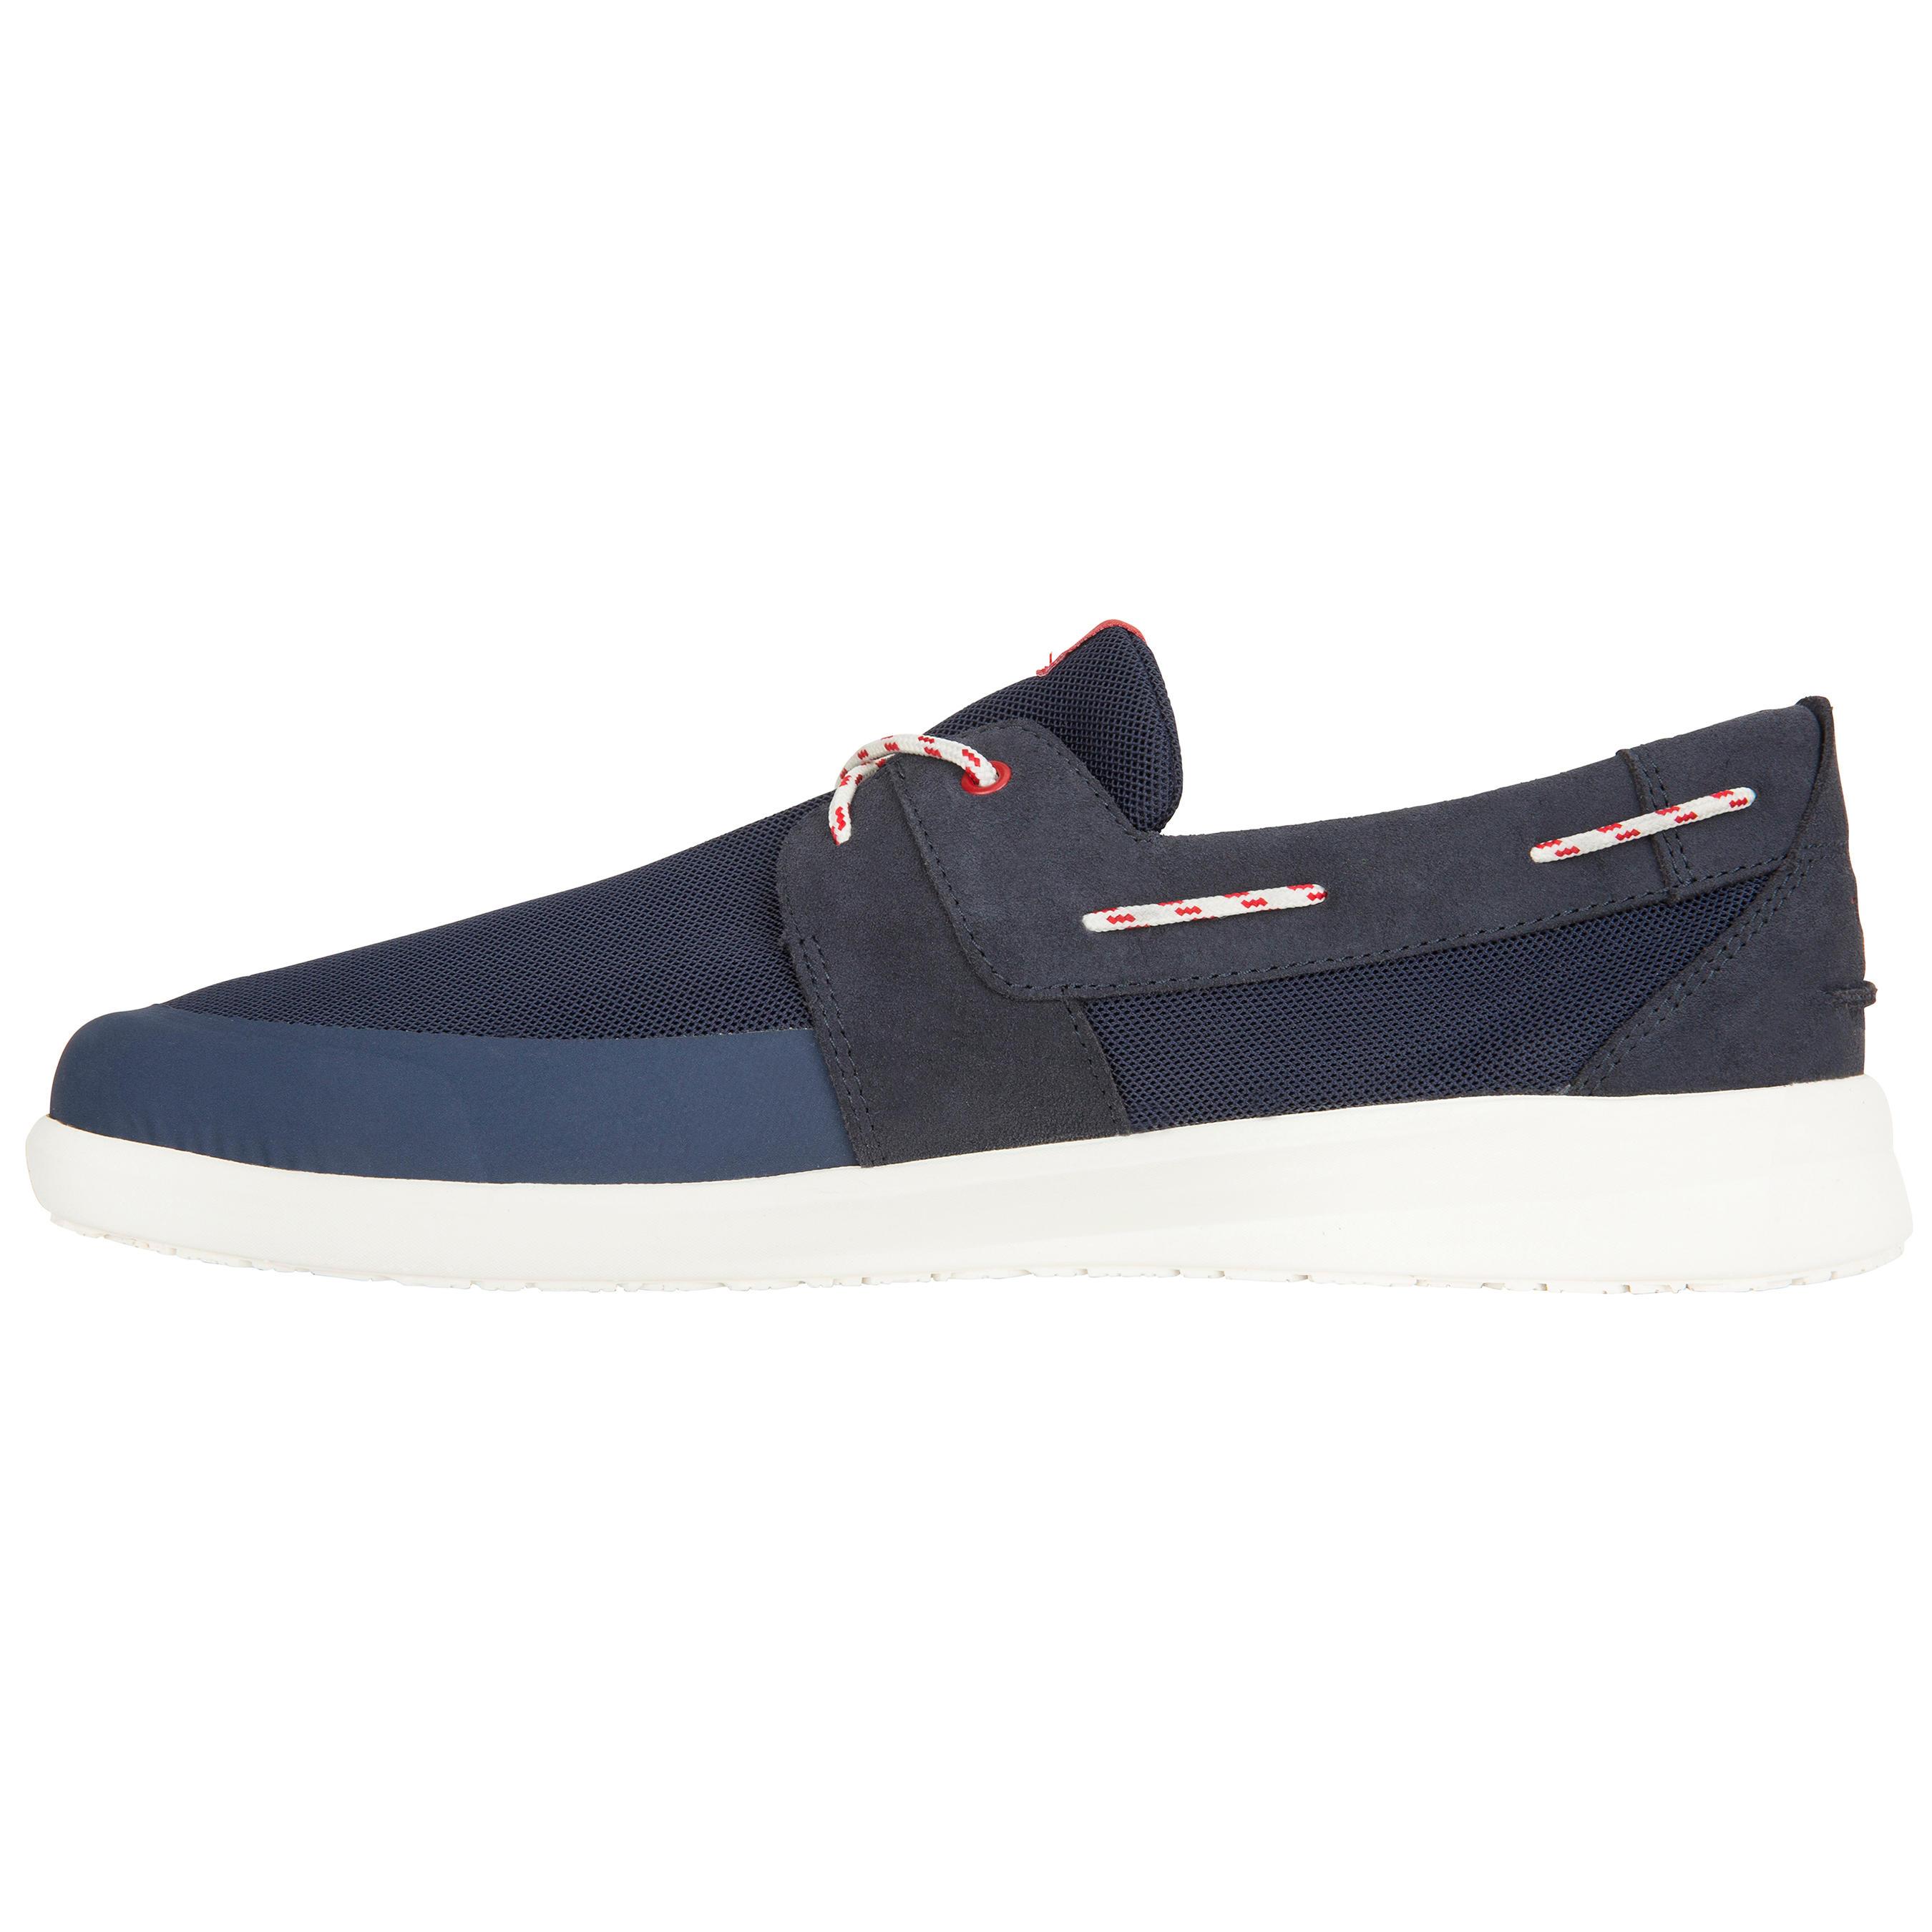 Cruise 100 Men's Non-Slip Boat Shoes - Navy